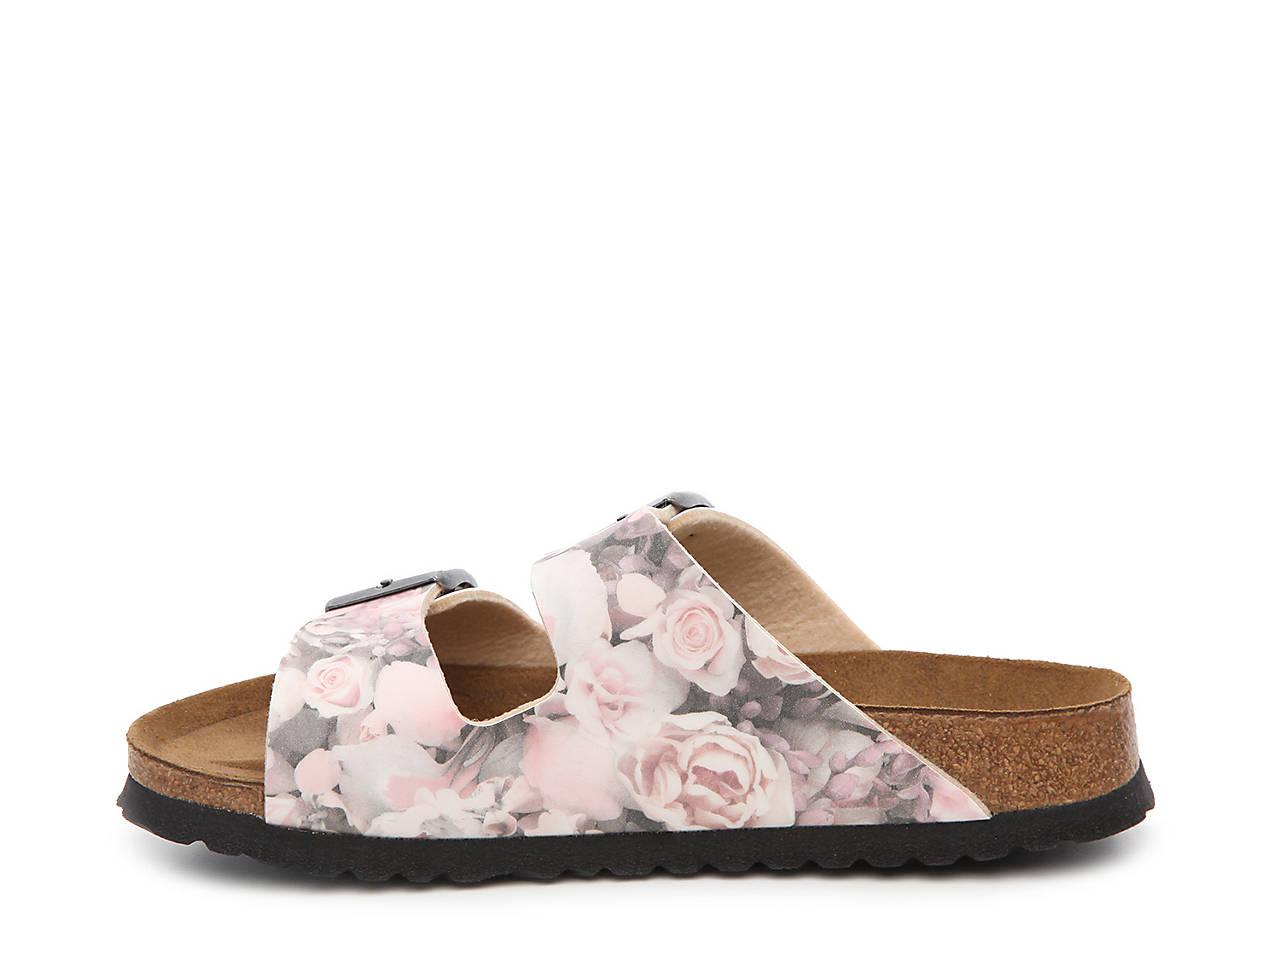 df135300d680 Papillio by Birkenstock Arizona Silky Rose Flat Sandal Women s Shoes ...